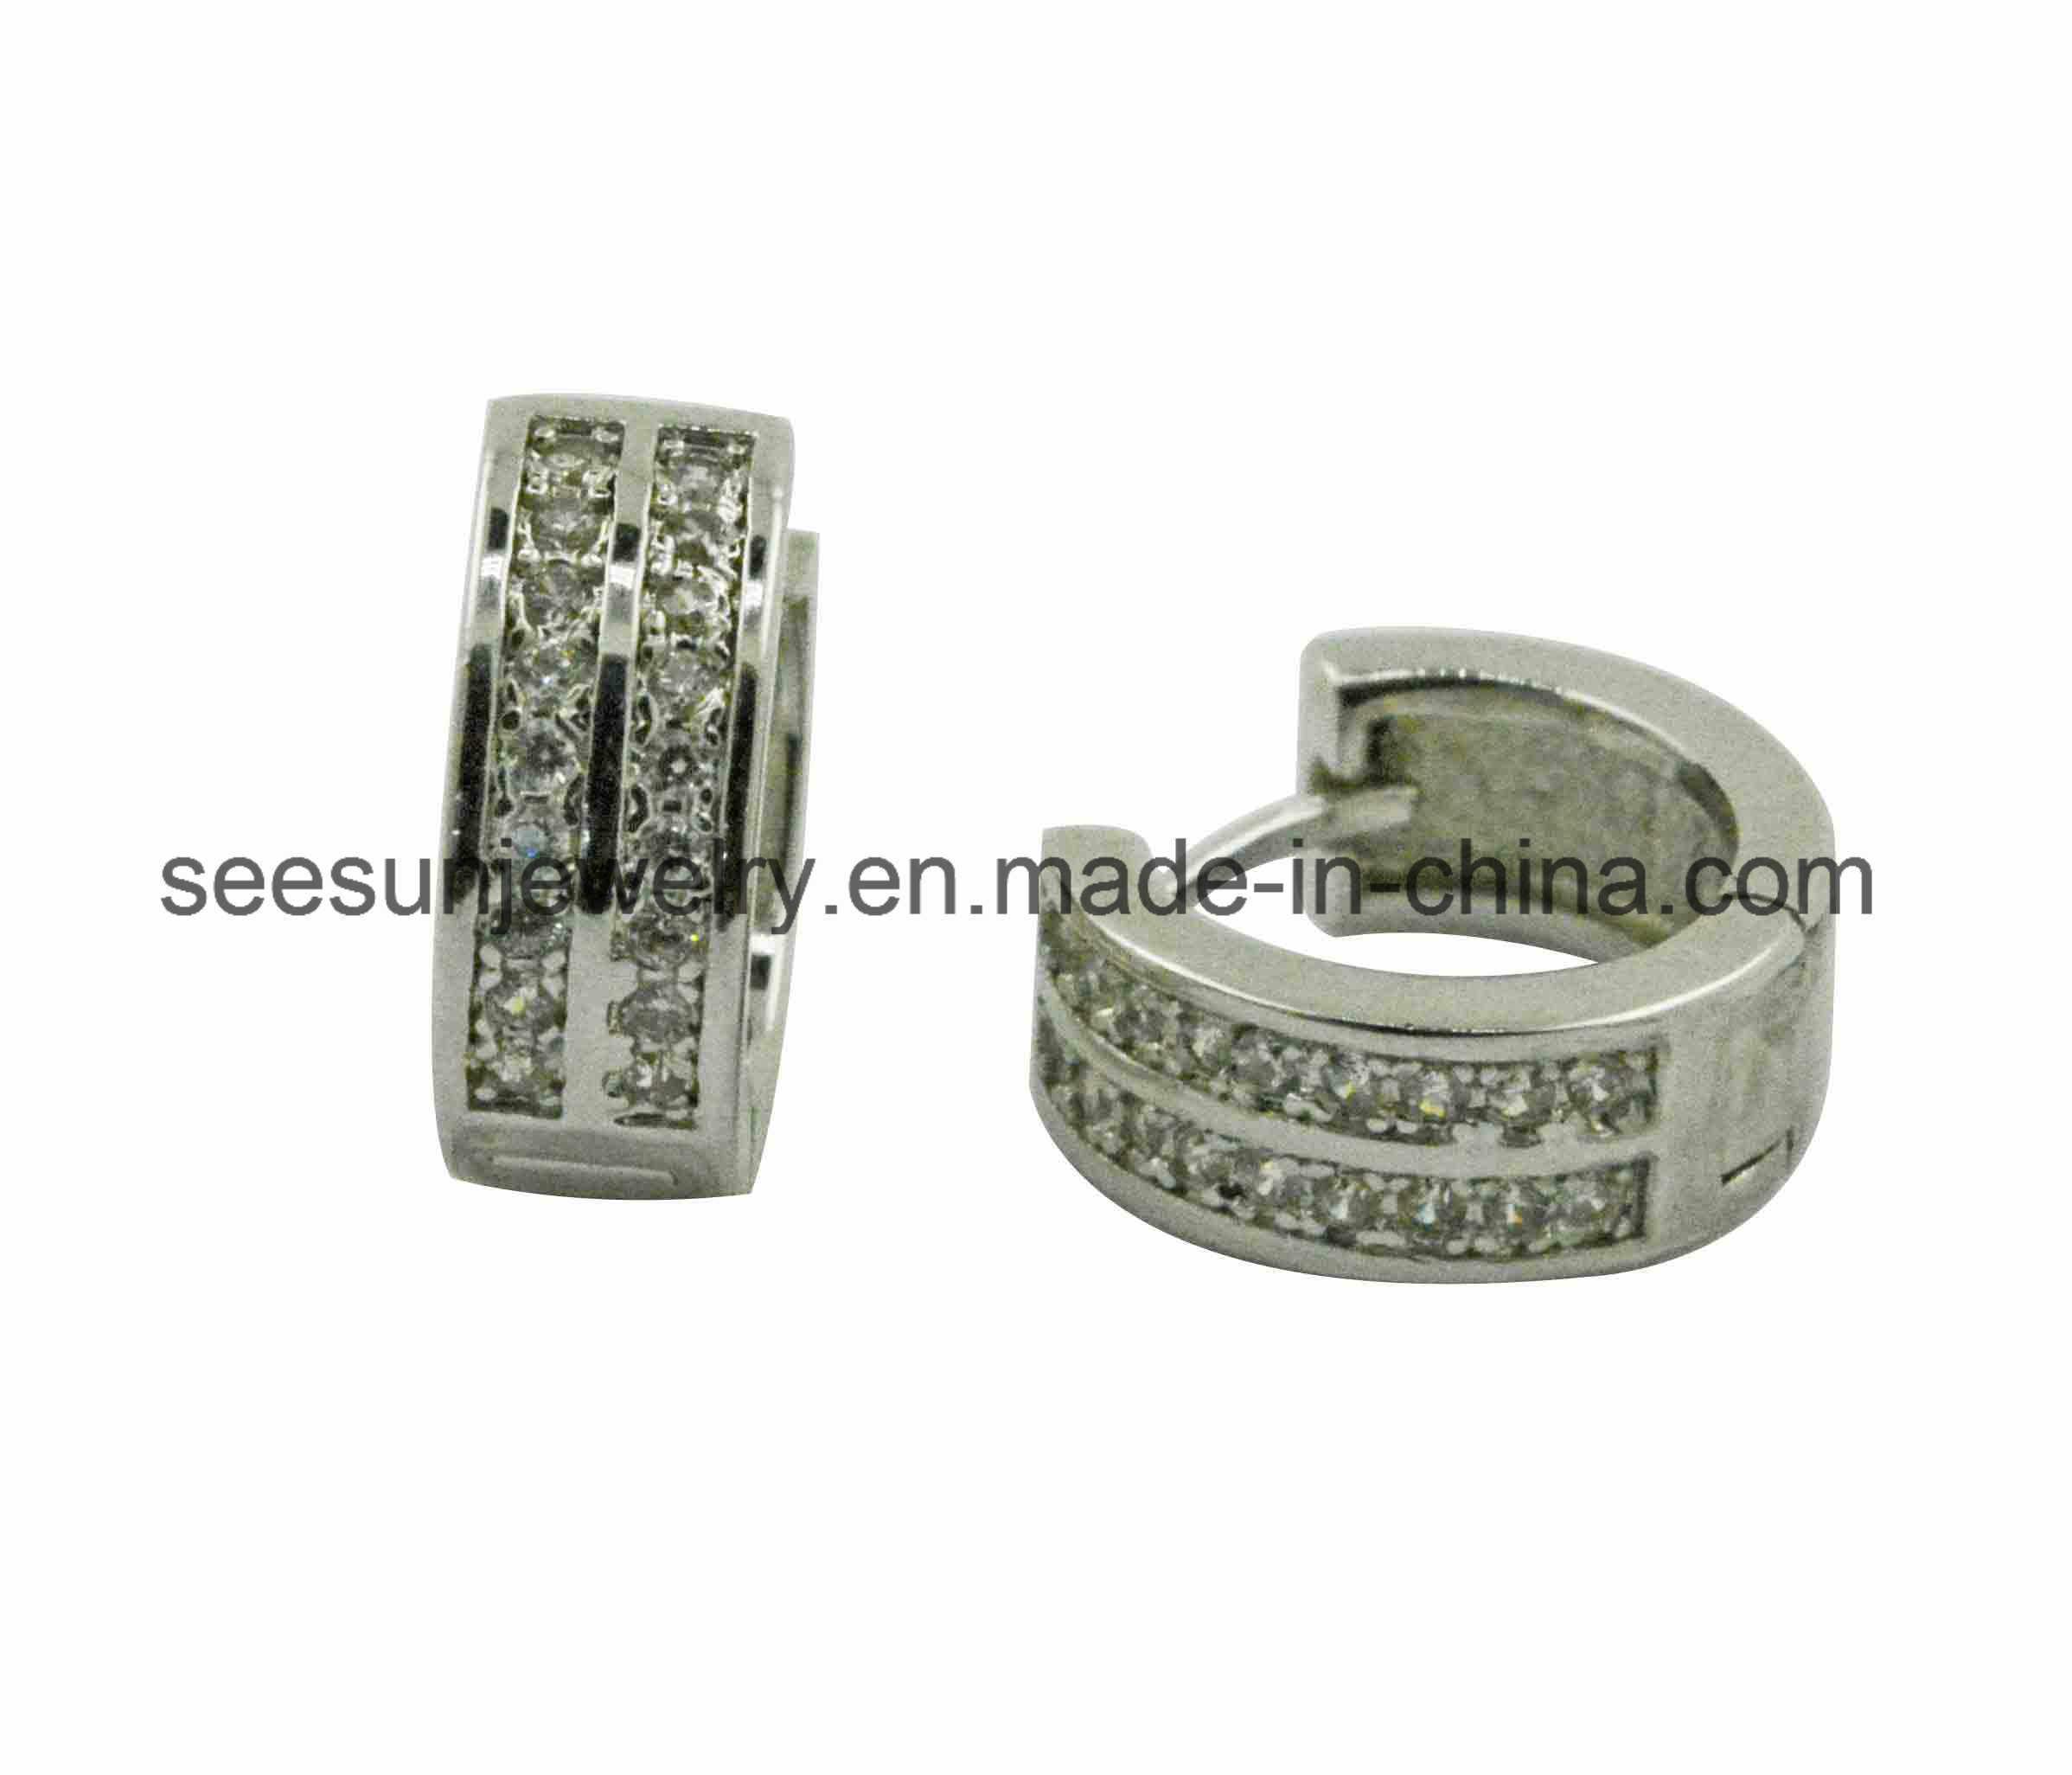 925 Silver Jewelry Good Selling Huggies Earring for Women